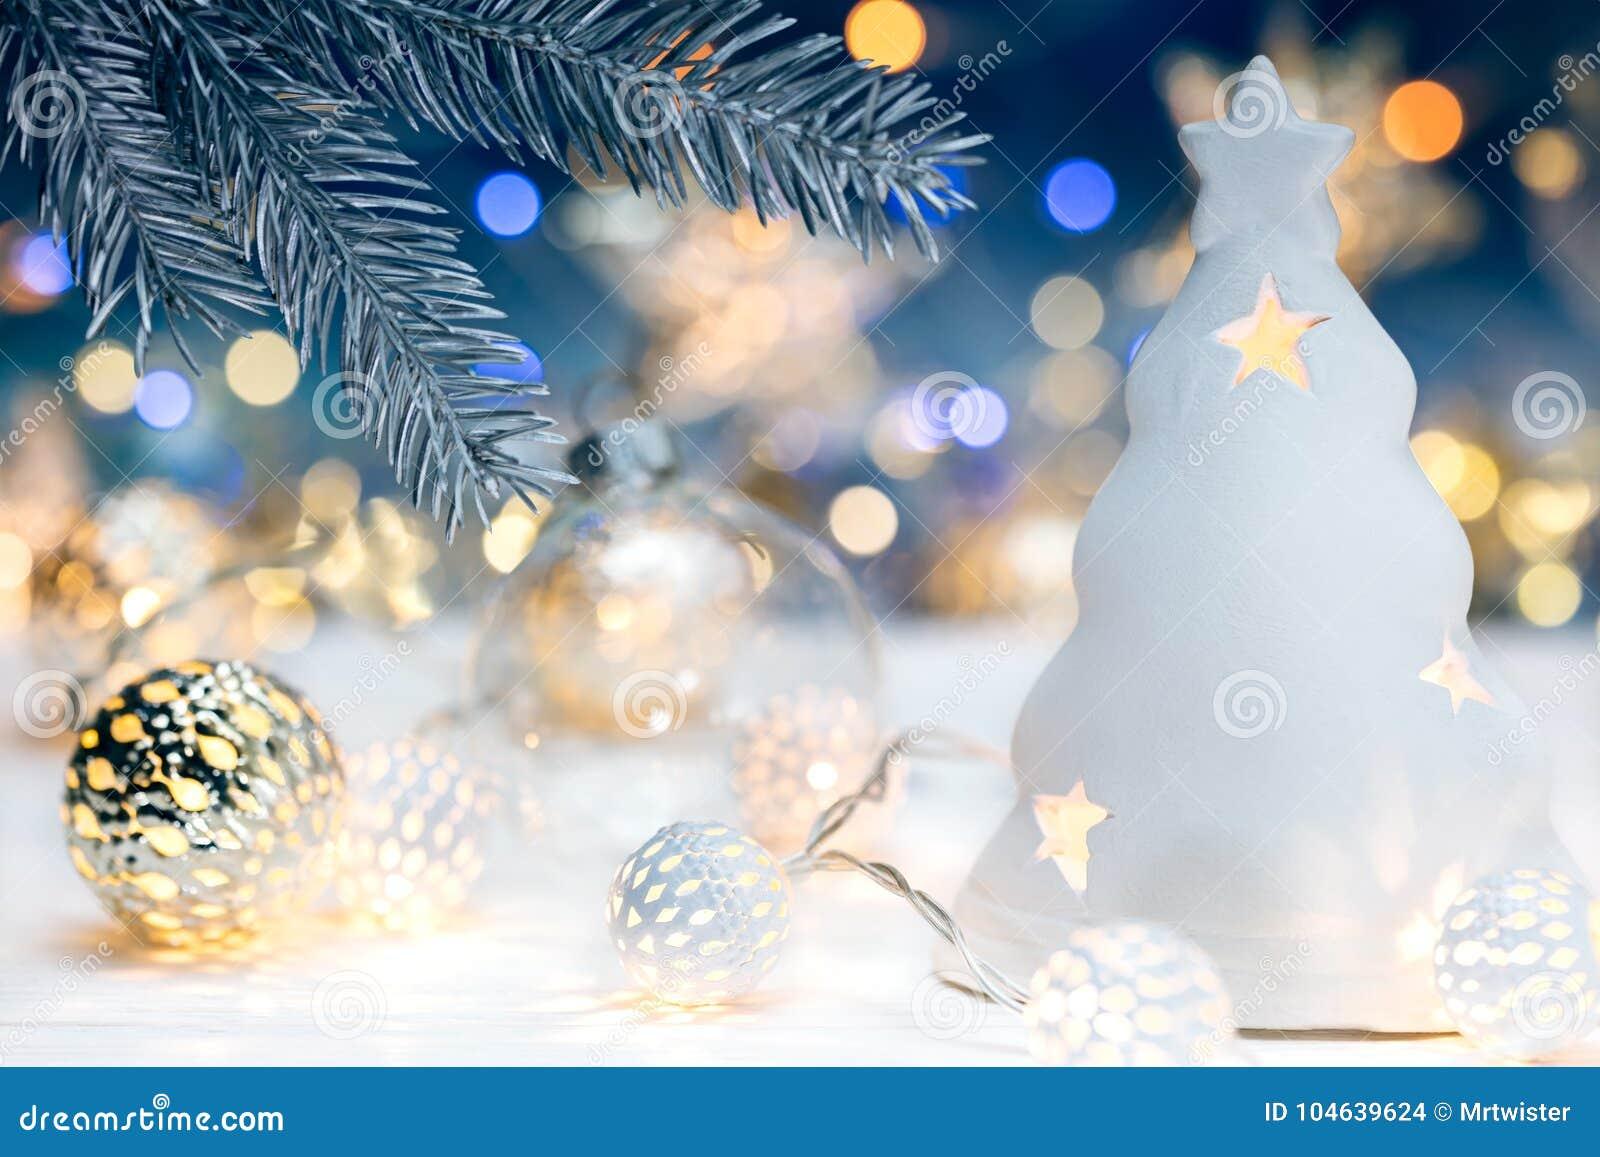 Download Vage Kerstmis Steekt Achtergrond Met Sparrentak En HOL Aan Stock Foto - Afbeelding bestaande uit decor, raad: 104639624